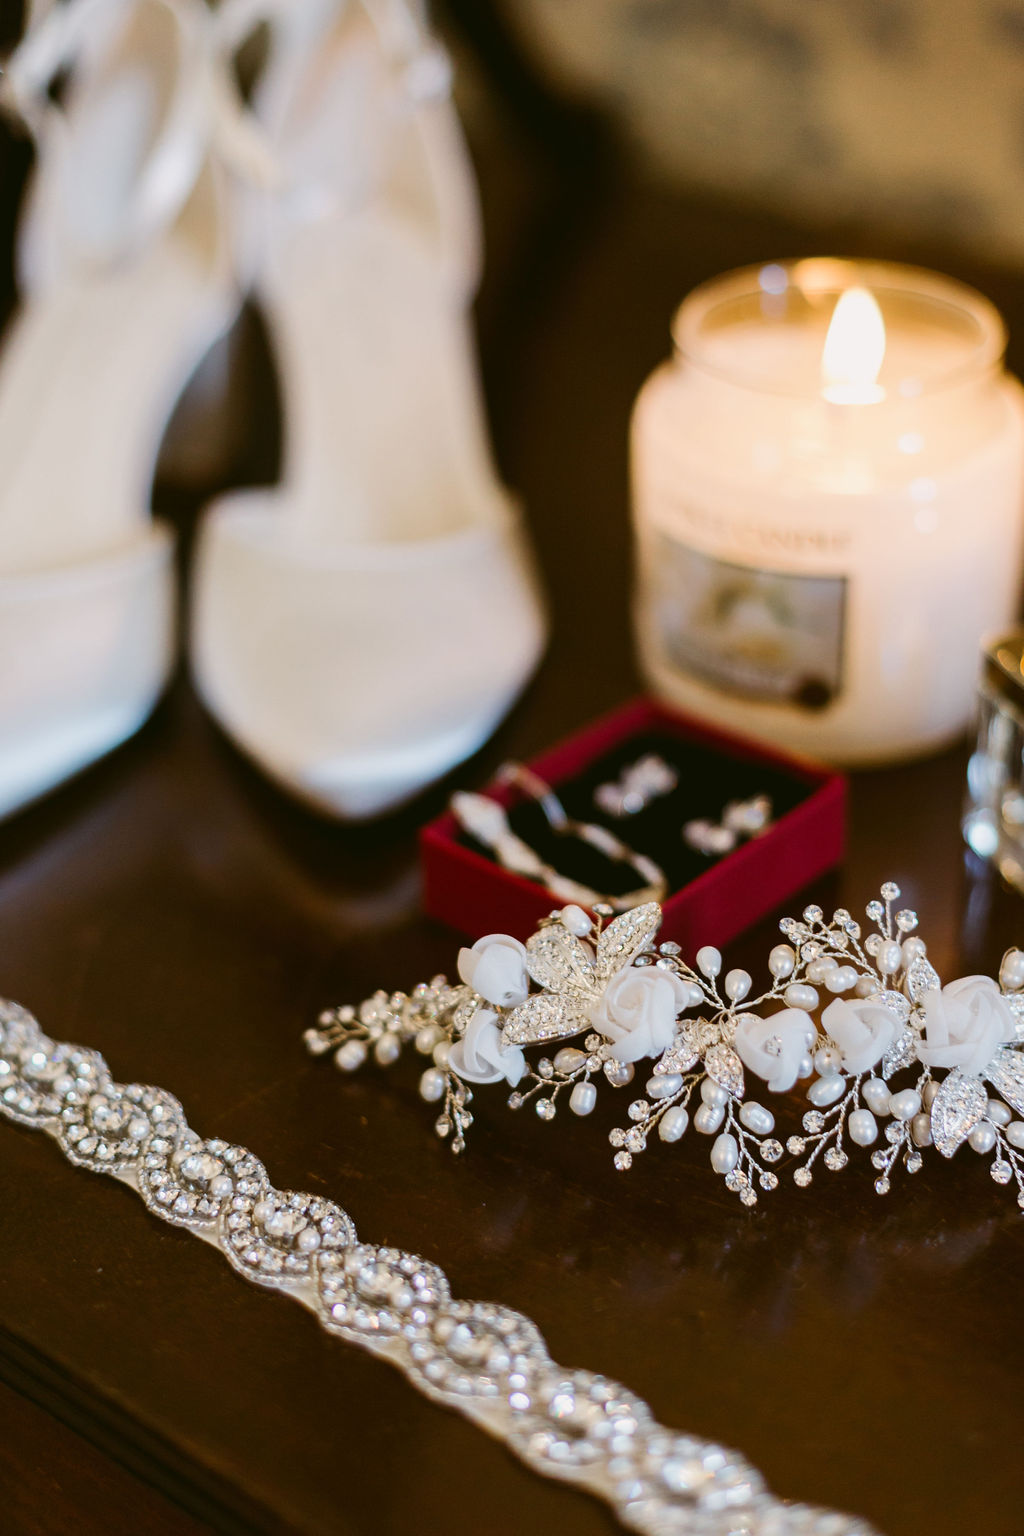 Wedding Hair Piece Jewellery by Claire Notarangelo - Red Rocks | Aberdeen Wedding Jewellery | Elsick House Photography